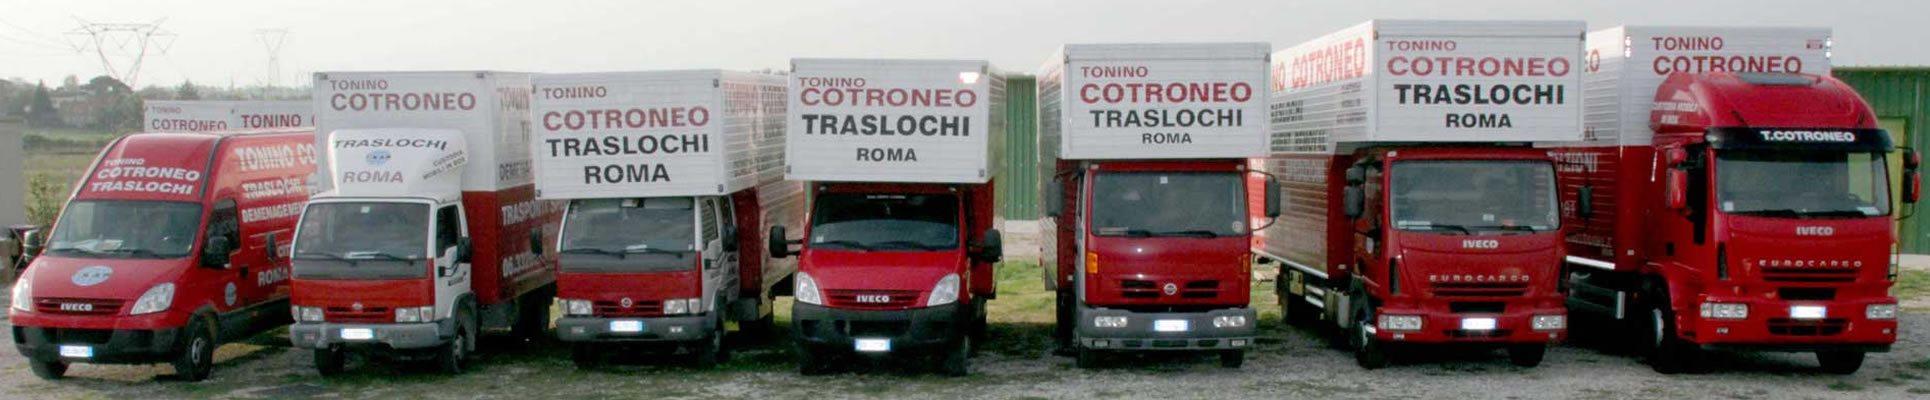 Flotta Traslochi Roma Tonino Cotroneo